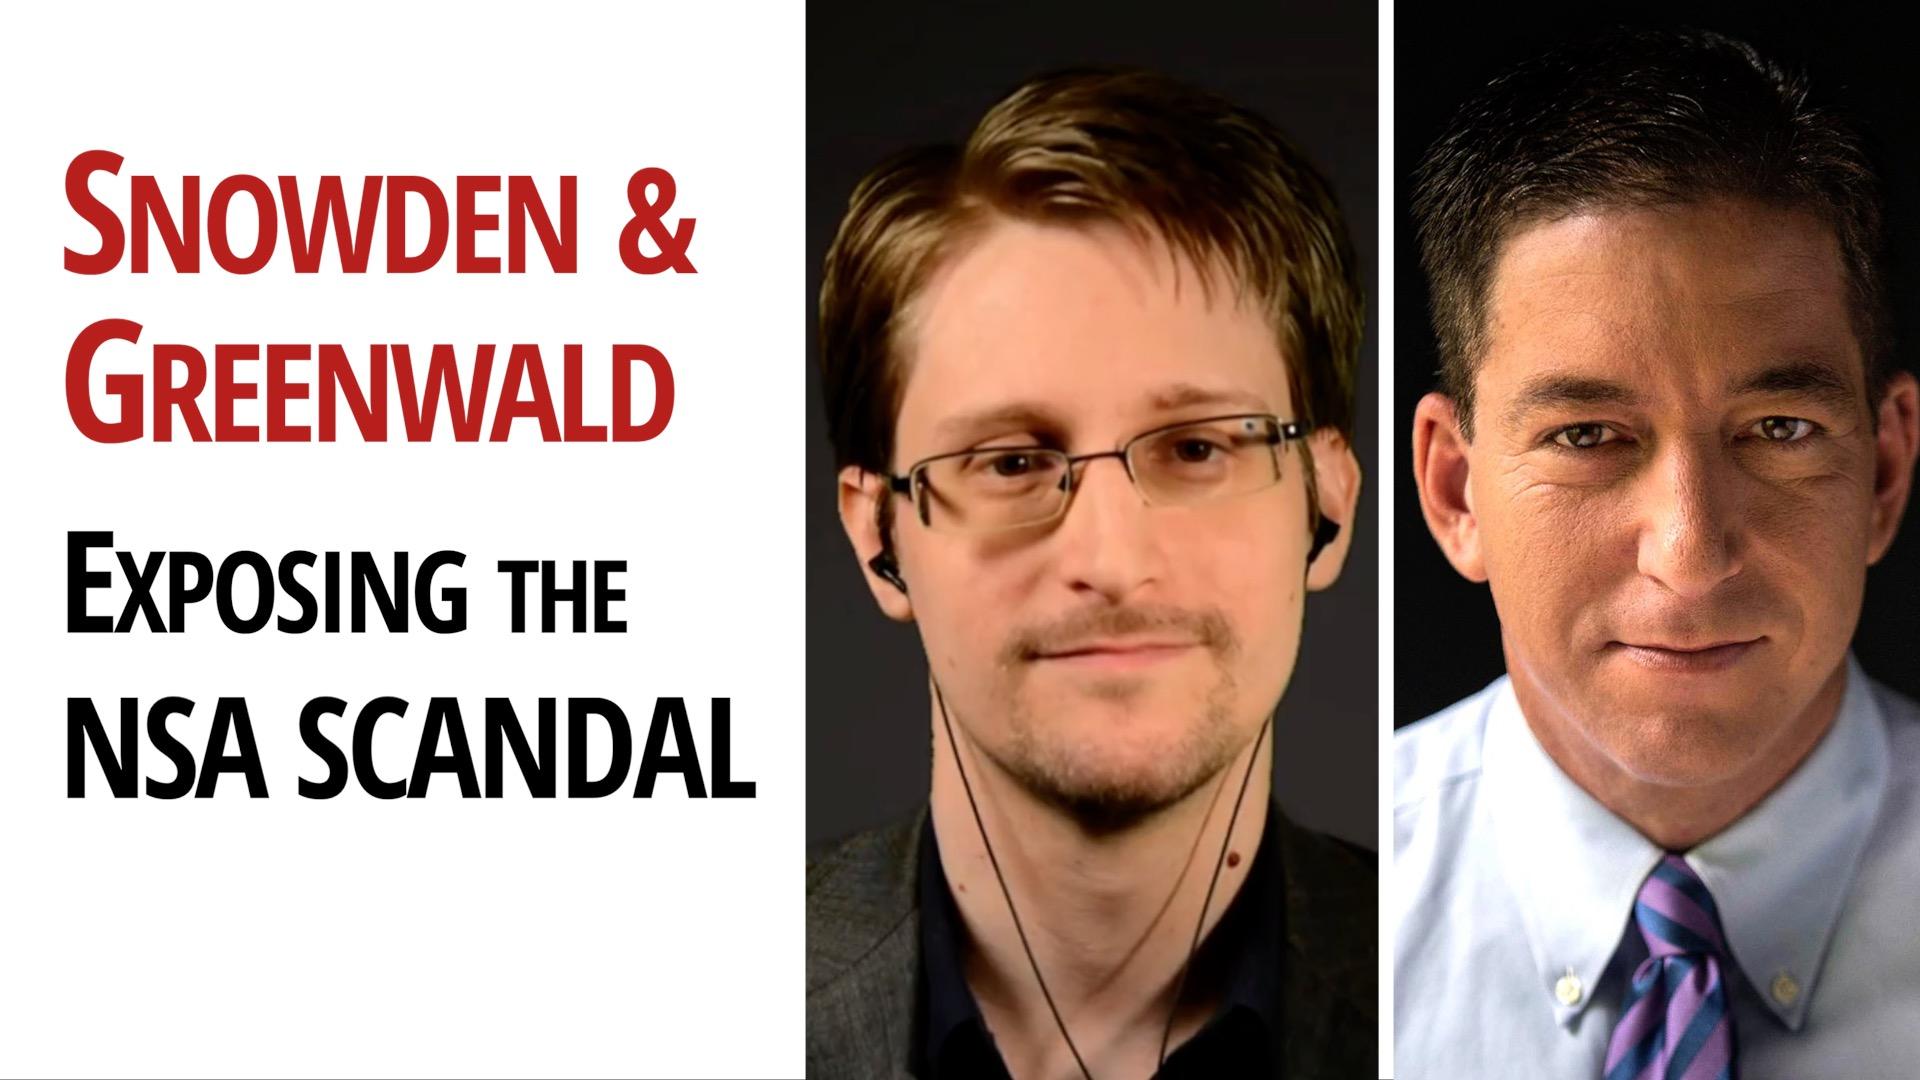 Edward Snowden & Glenn Greenwald - The NSA Scandal that shook the World